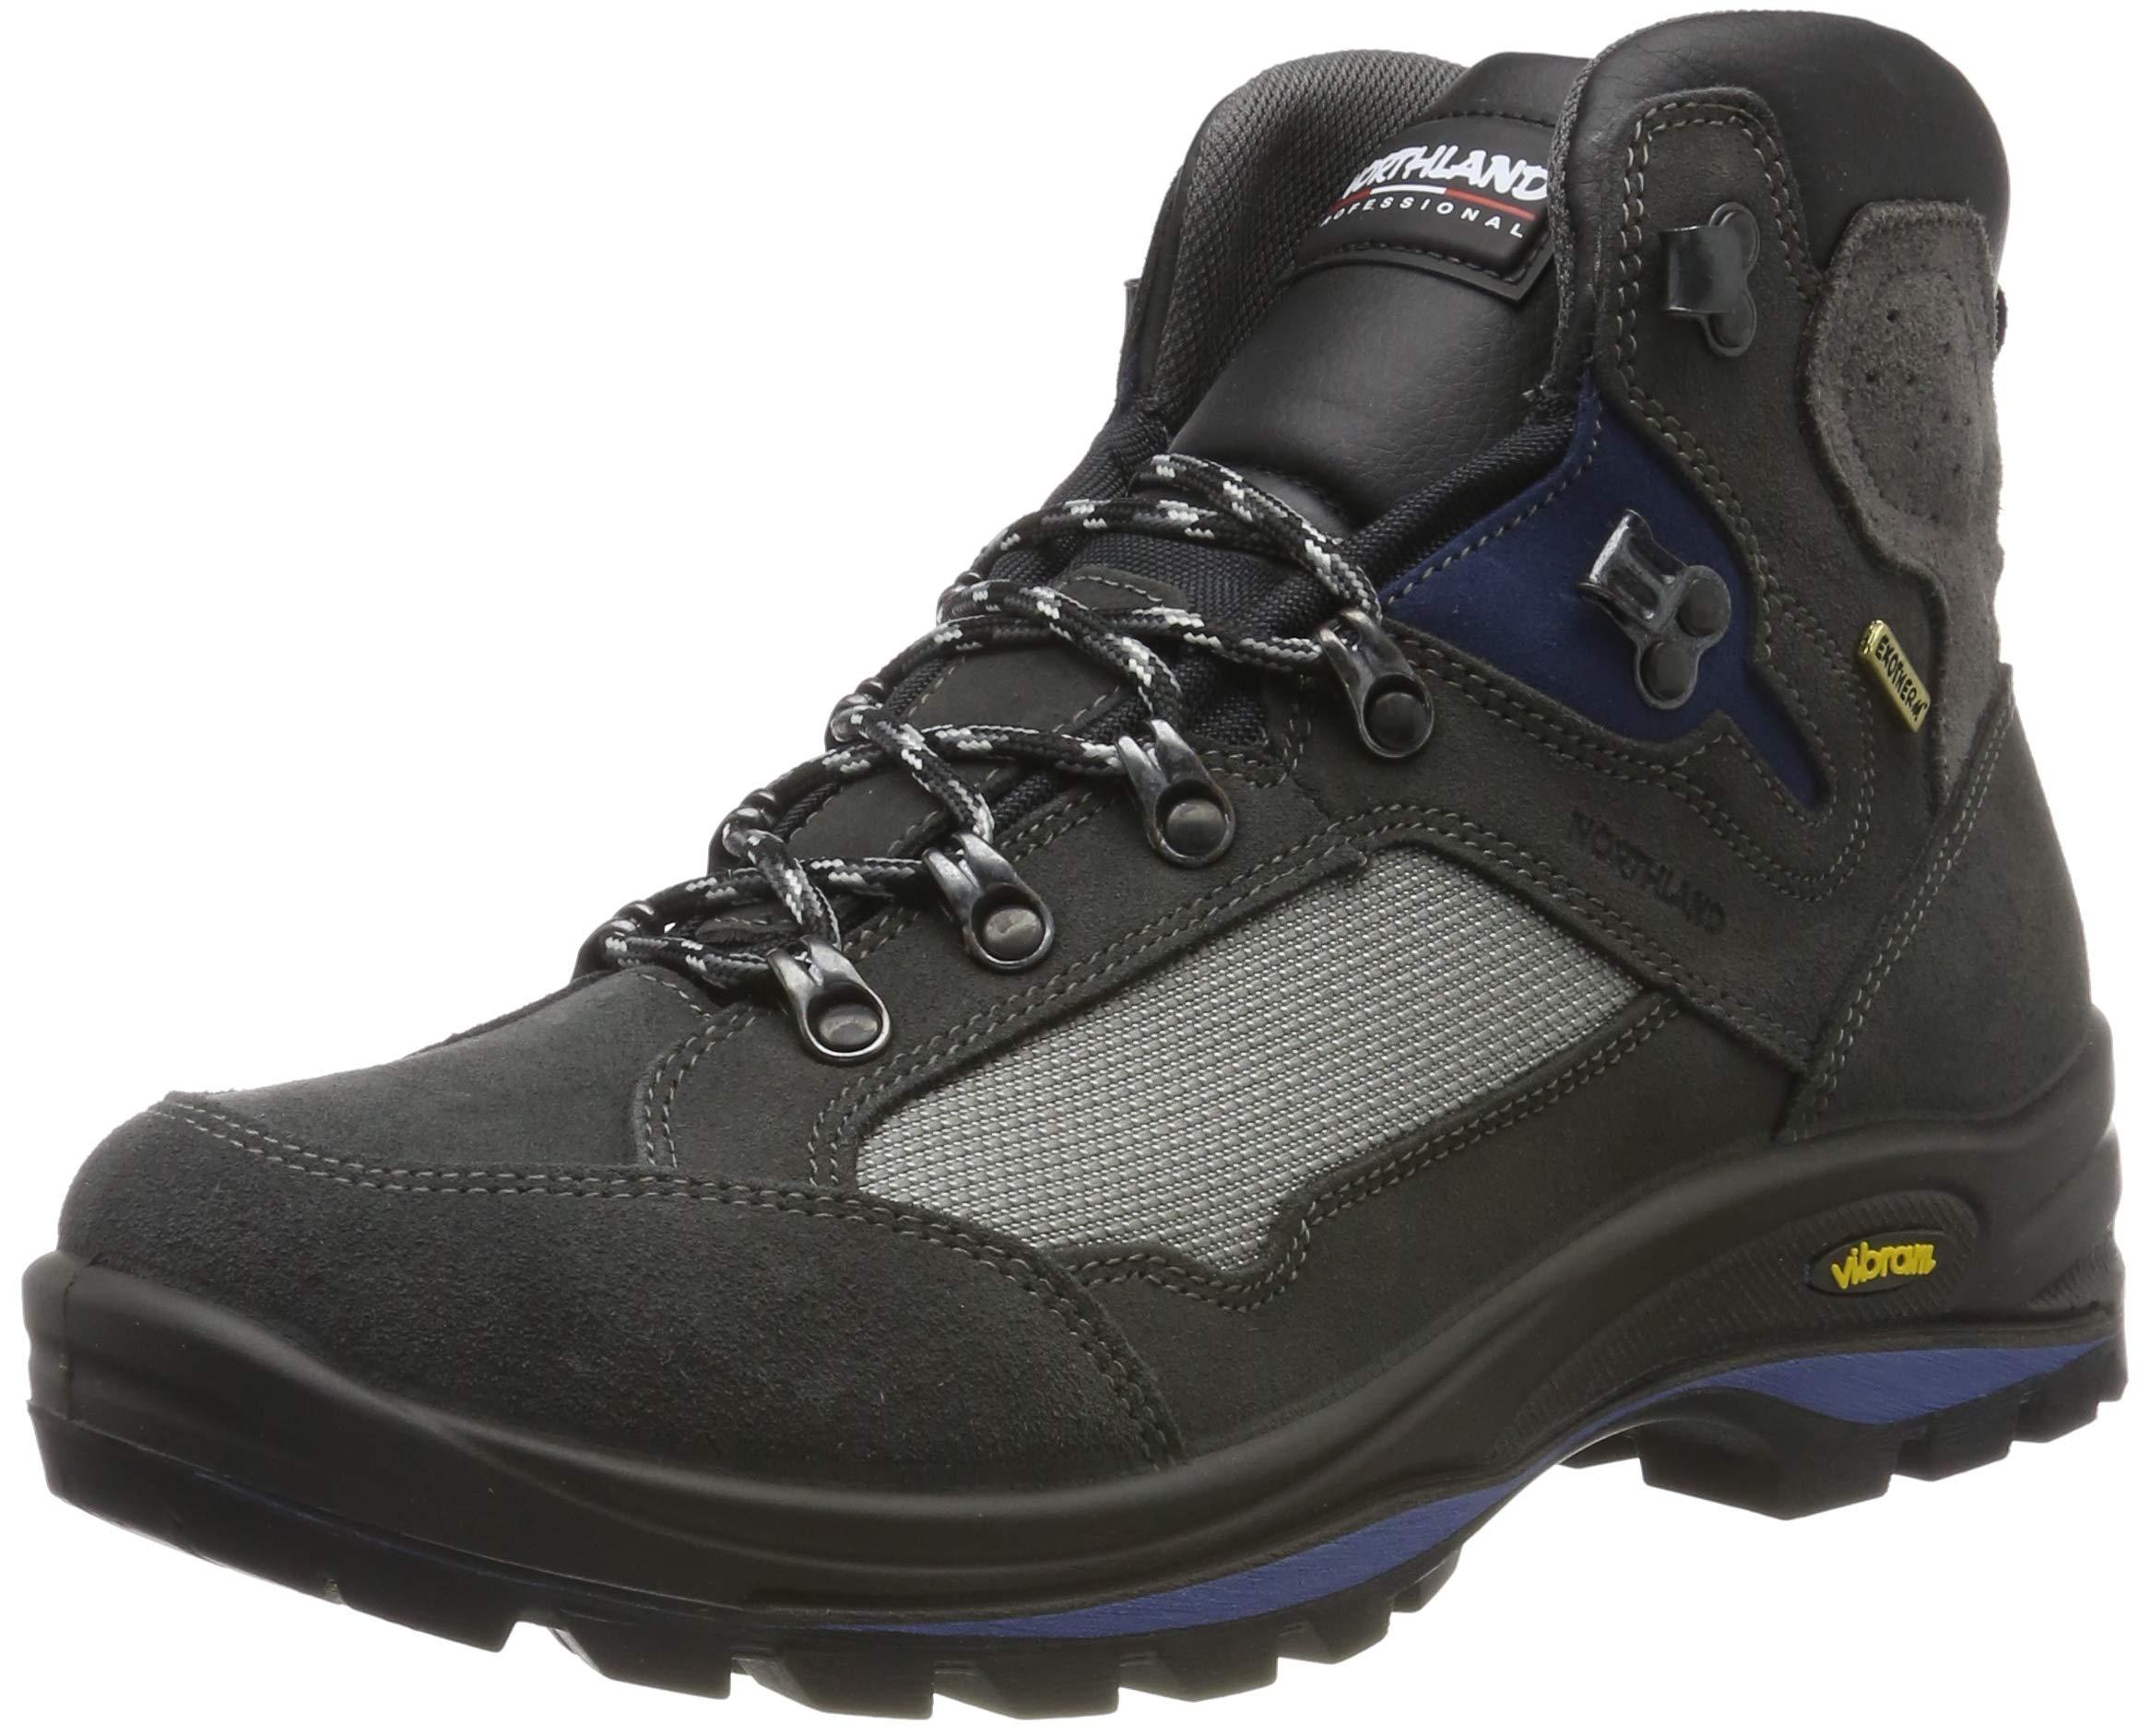 Boots Chaussures Ng Northland Randonn Eu navy44 Glockner Et De amp;eacutee HommeGrisdkGrey Hc Professional Trekking zVUpSM